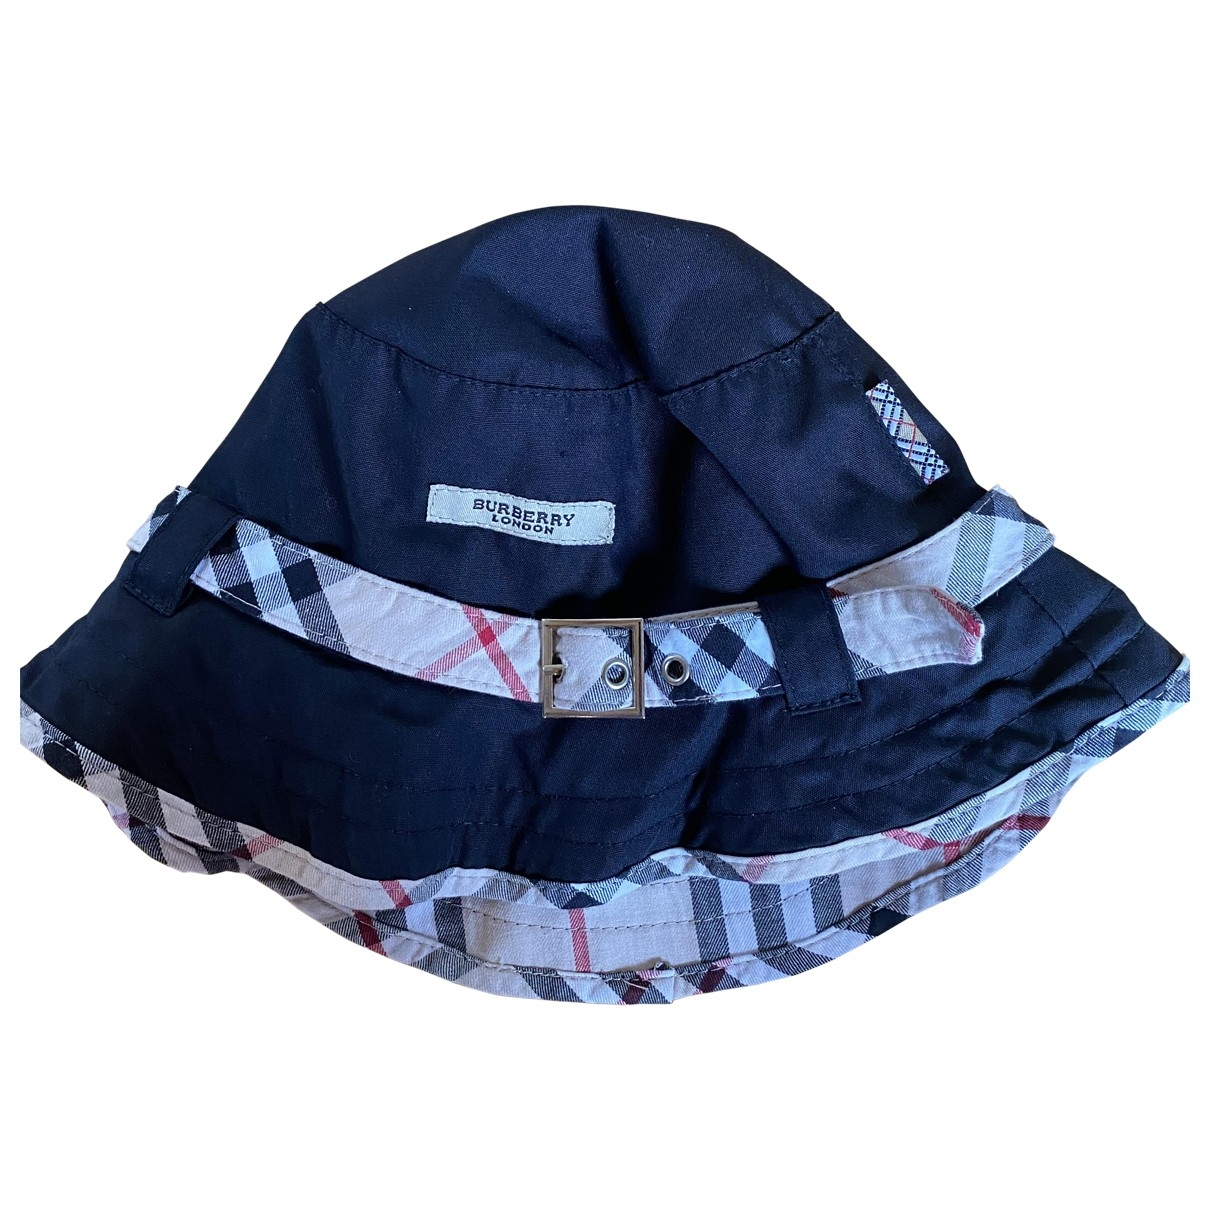 Burberry \N Black hat for Women M International